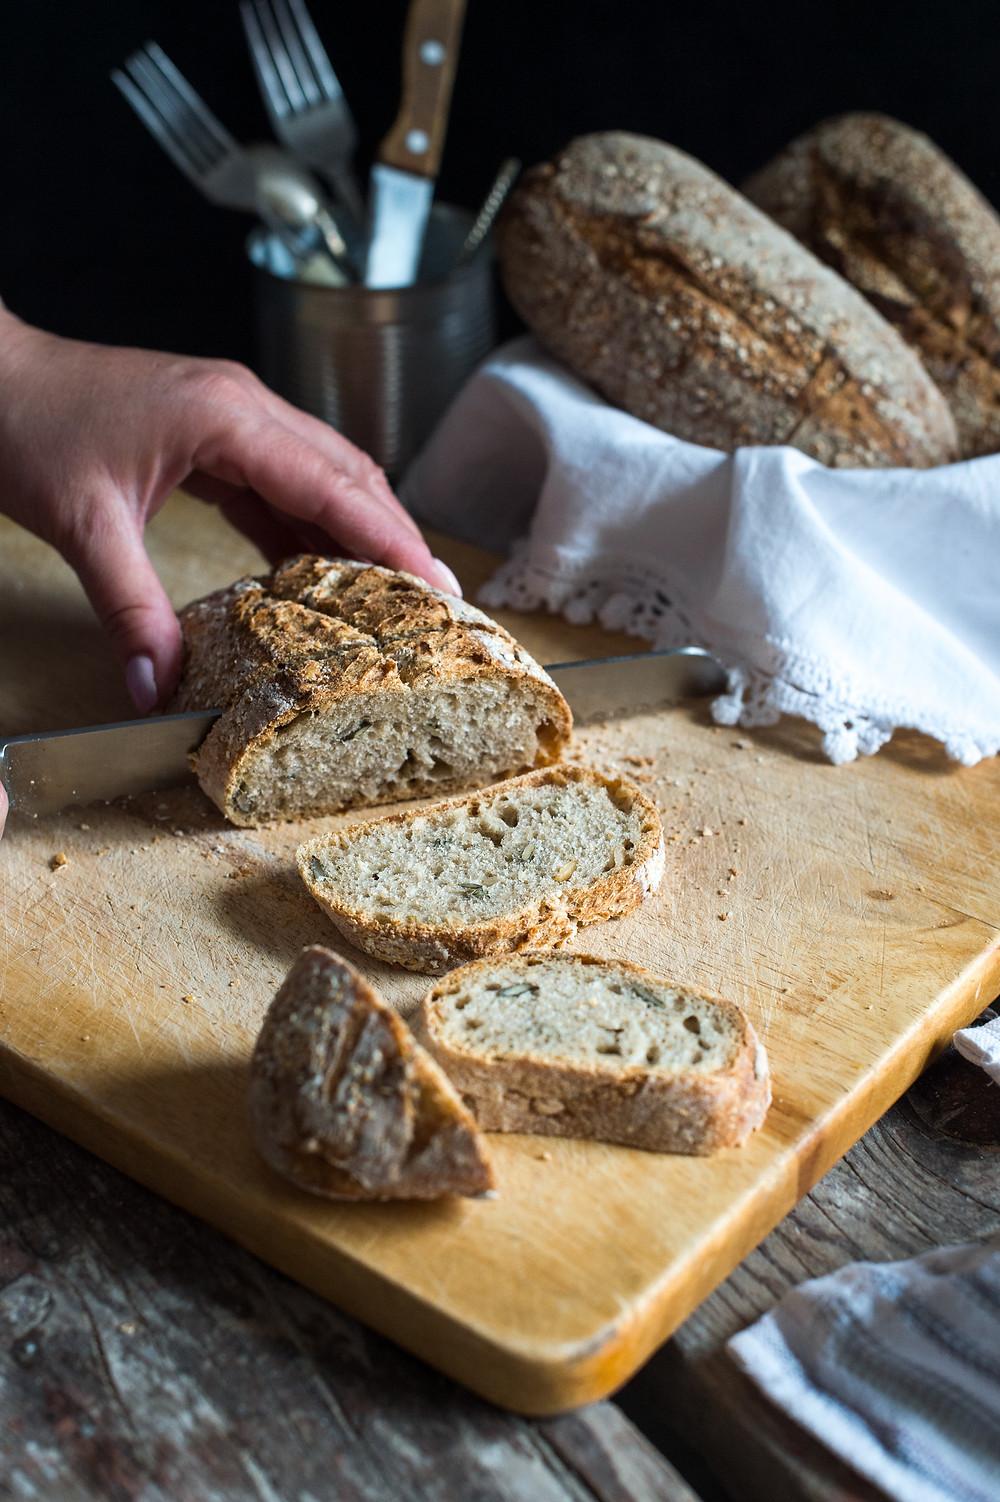 bread on a wooden cutting board sliced